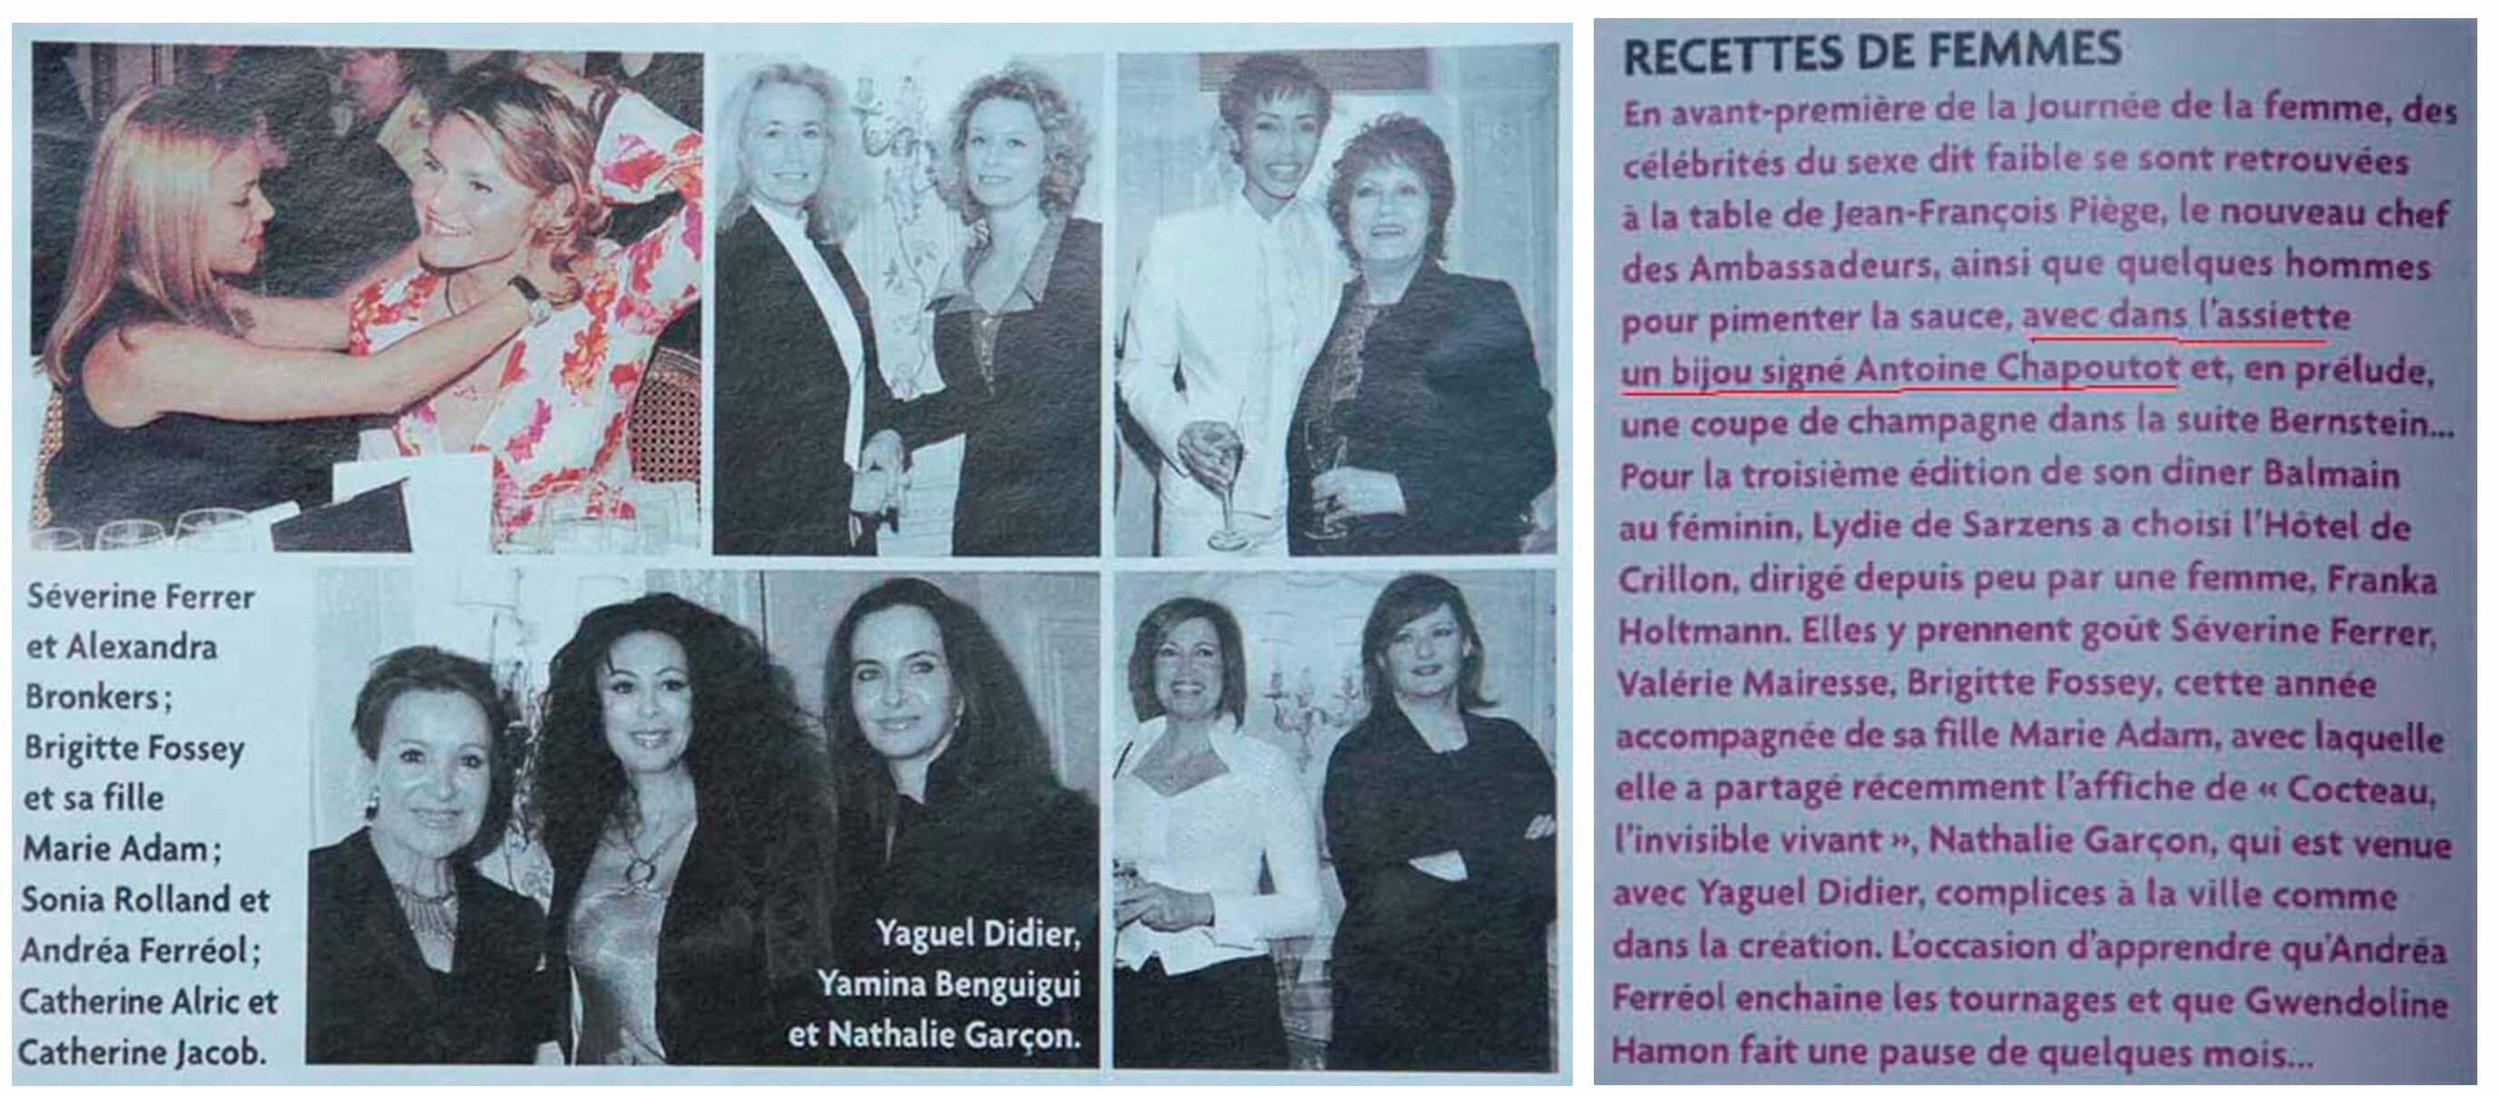 2004 Madame Figaro - 1er Mars - Article & photo.jpg